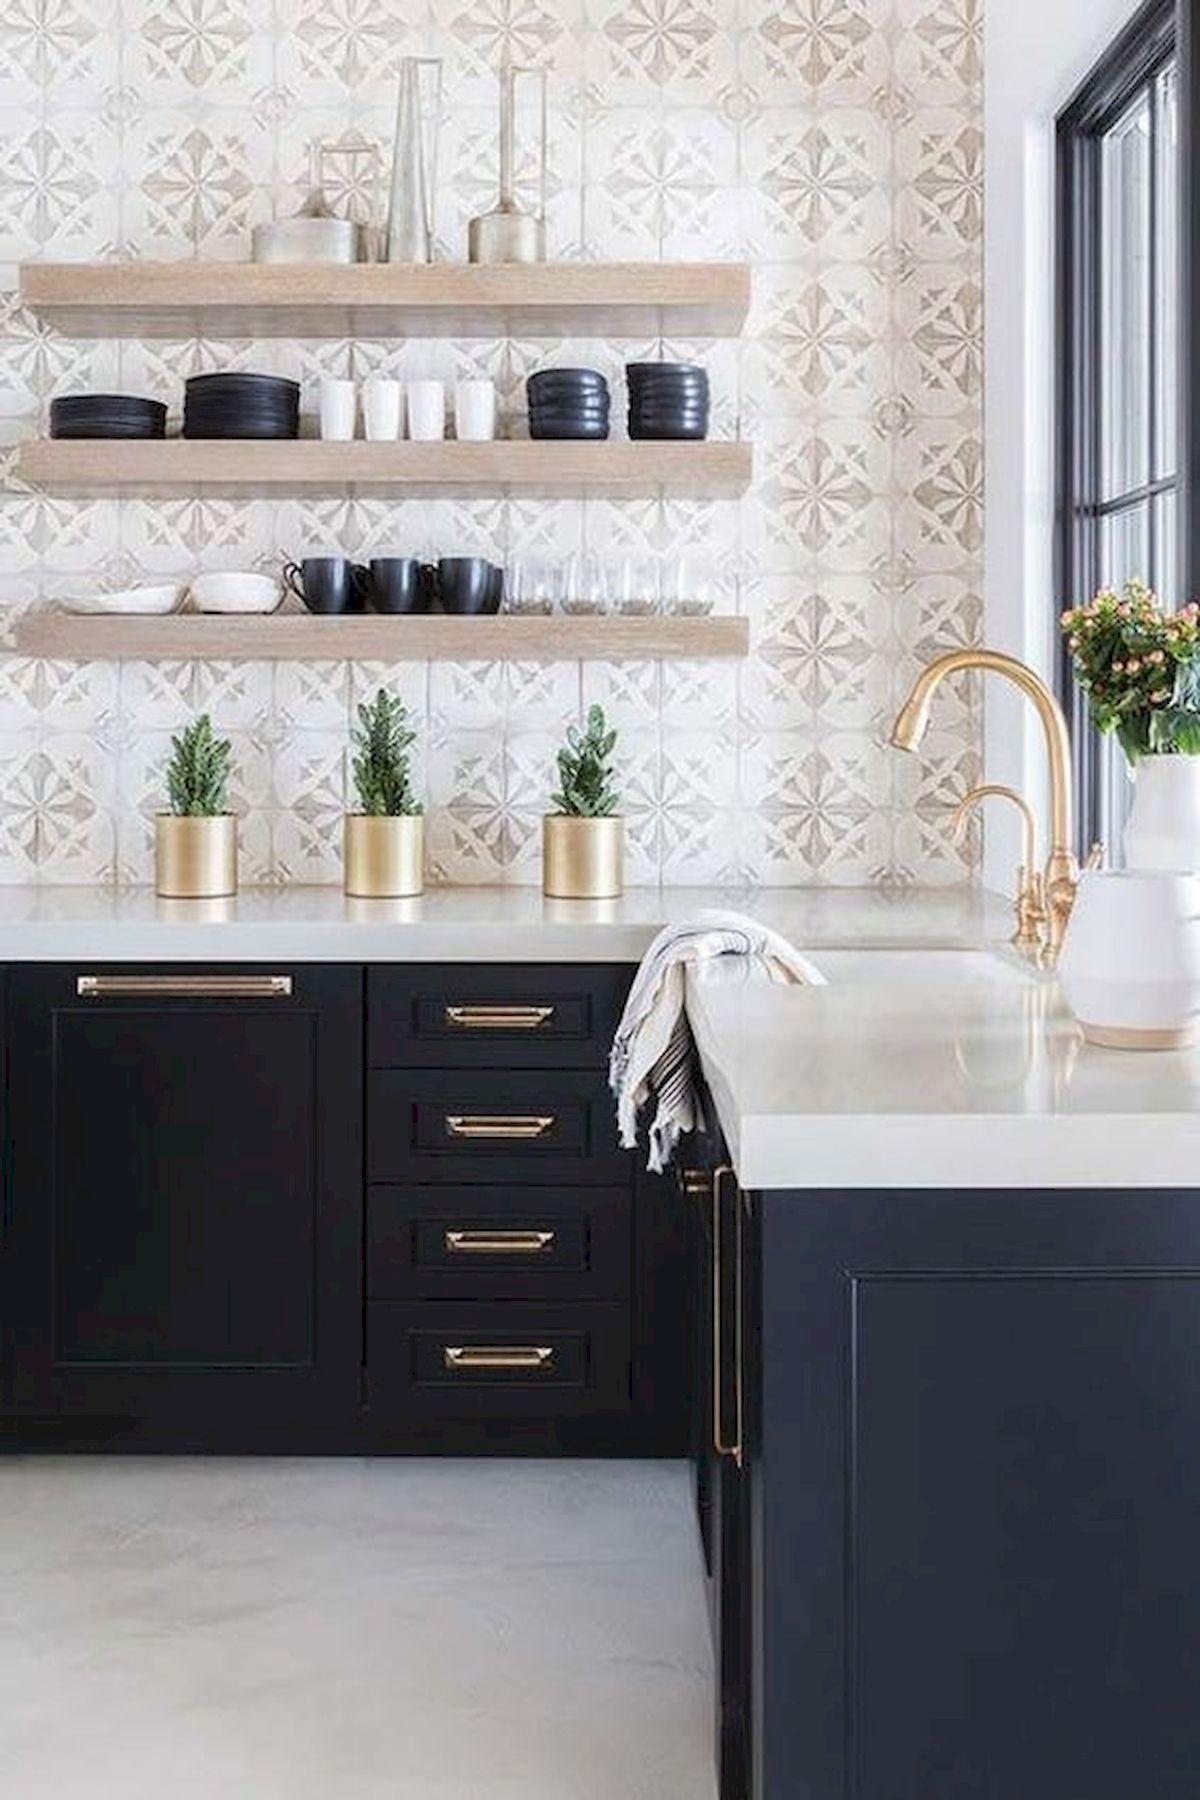 45 Easy Kitchen Decor and Design Ideas (34)